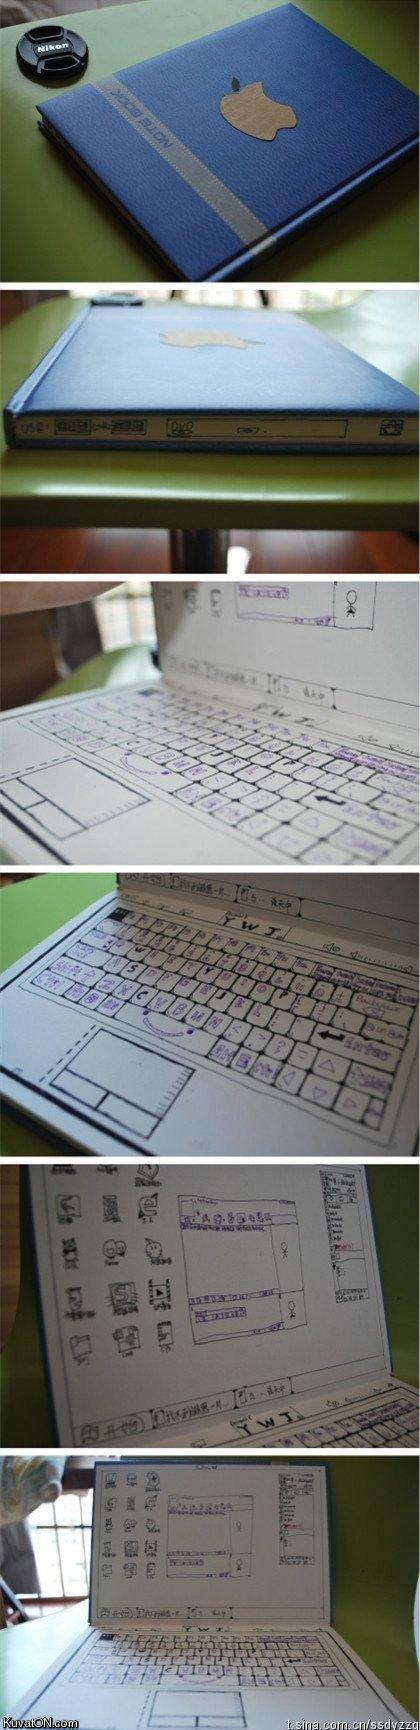 L'univers des Geeks - Page 4 Mac_notebook